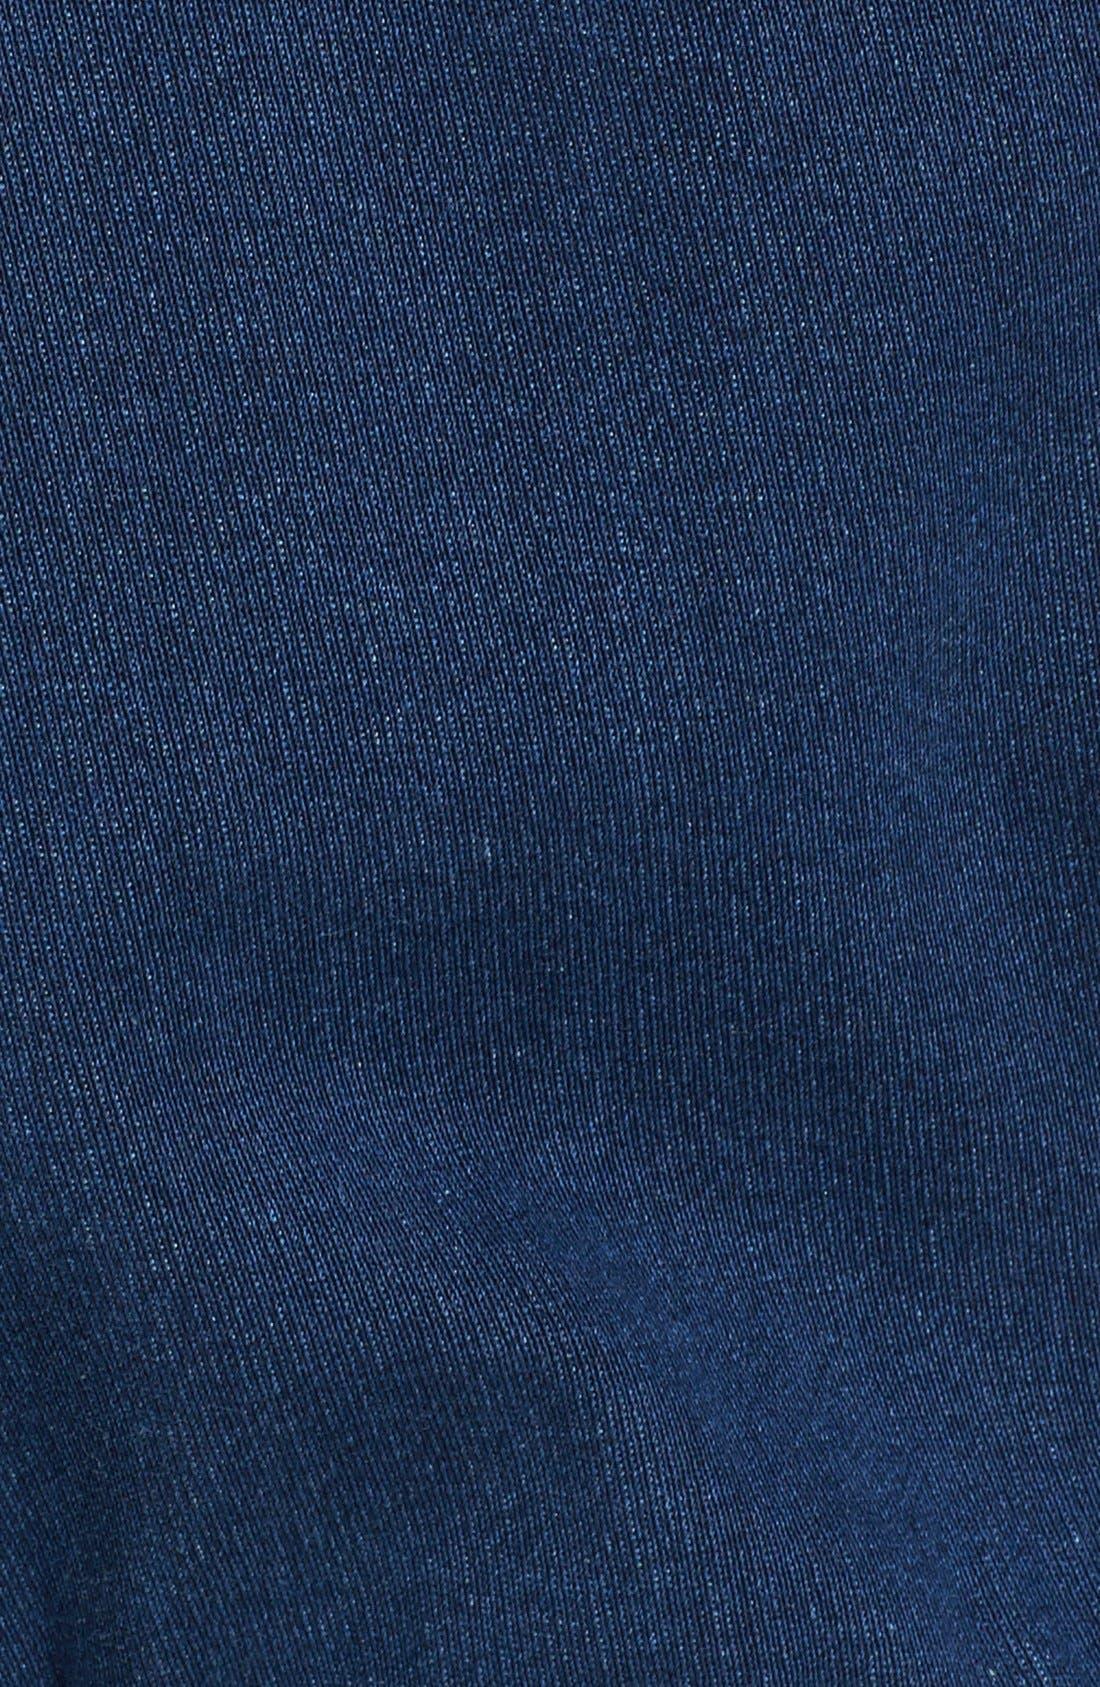 Alternate Image 7  - IVY PARK® Logo Denim Jumpsuit